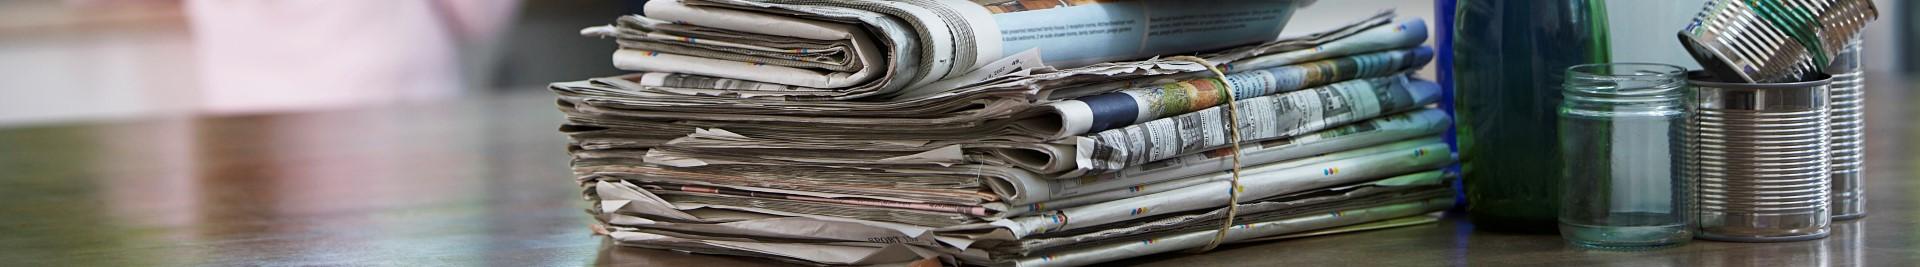 News Media Canada Stewardship Plan